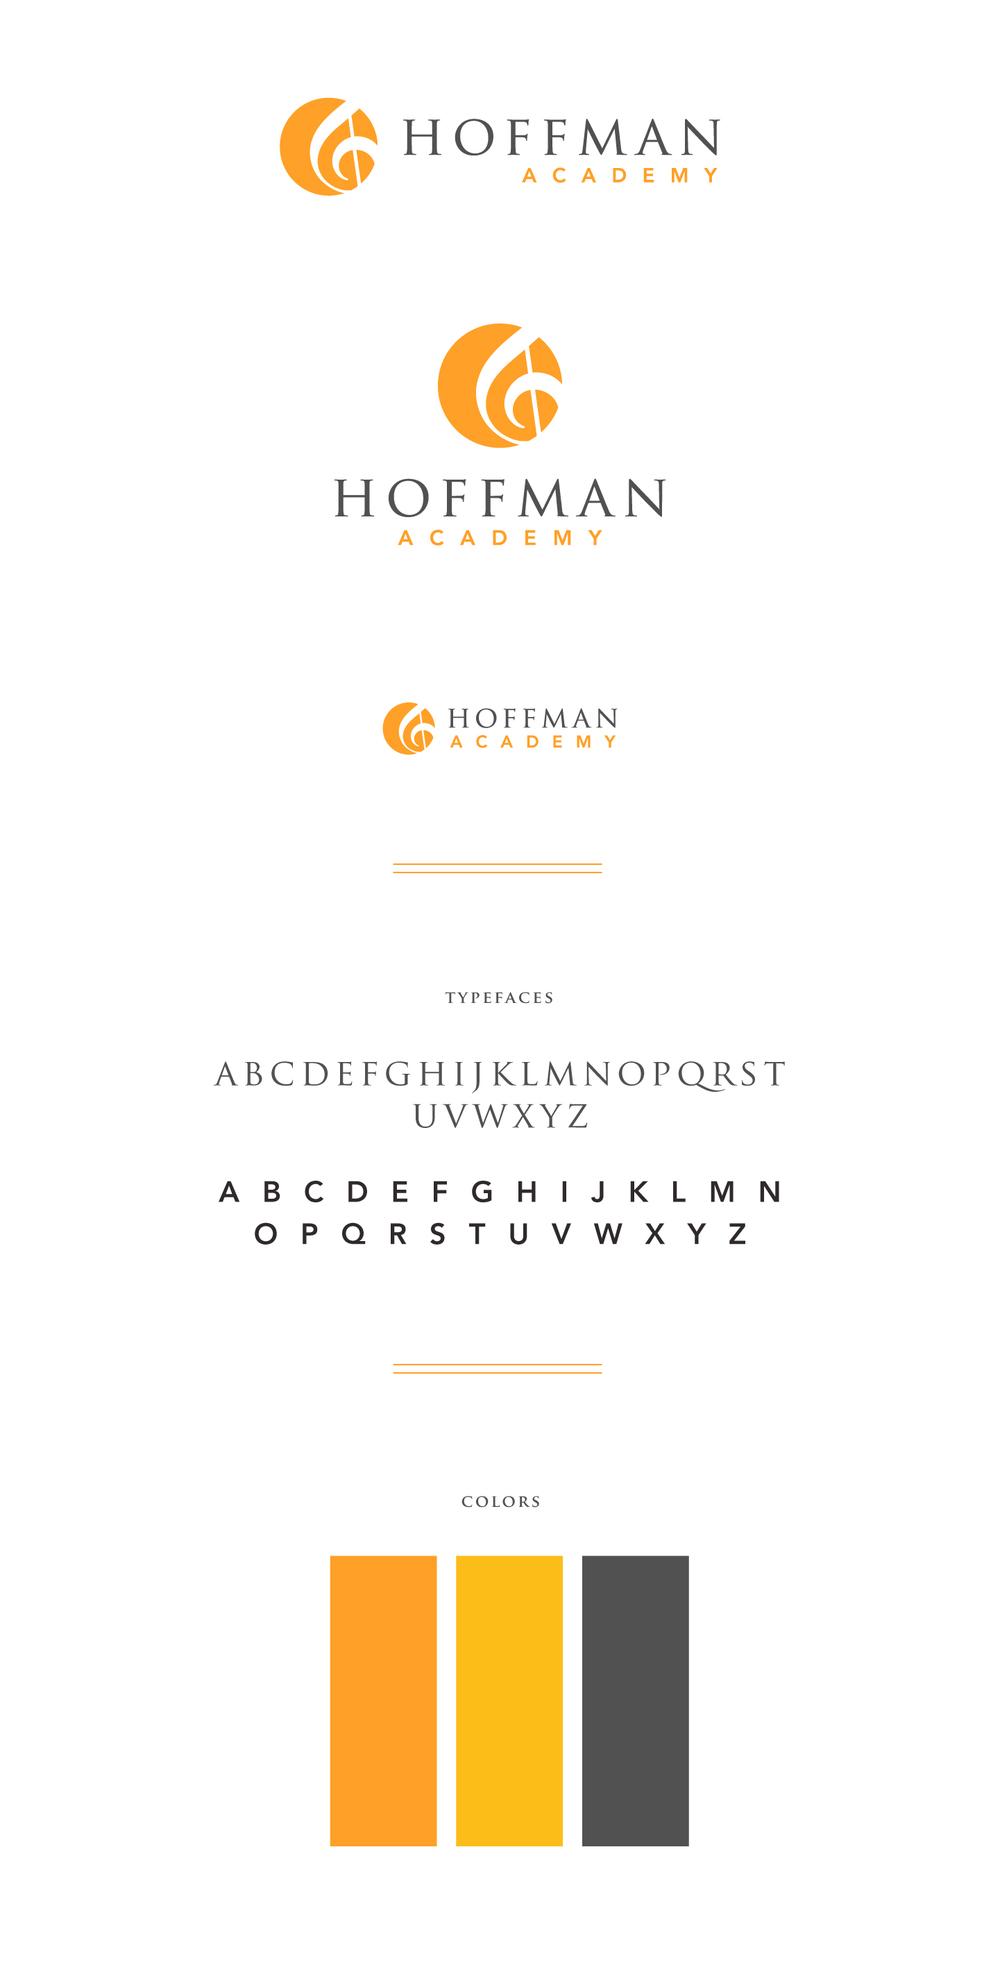 brittanyalise_hoffman_academy